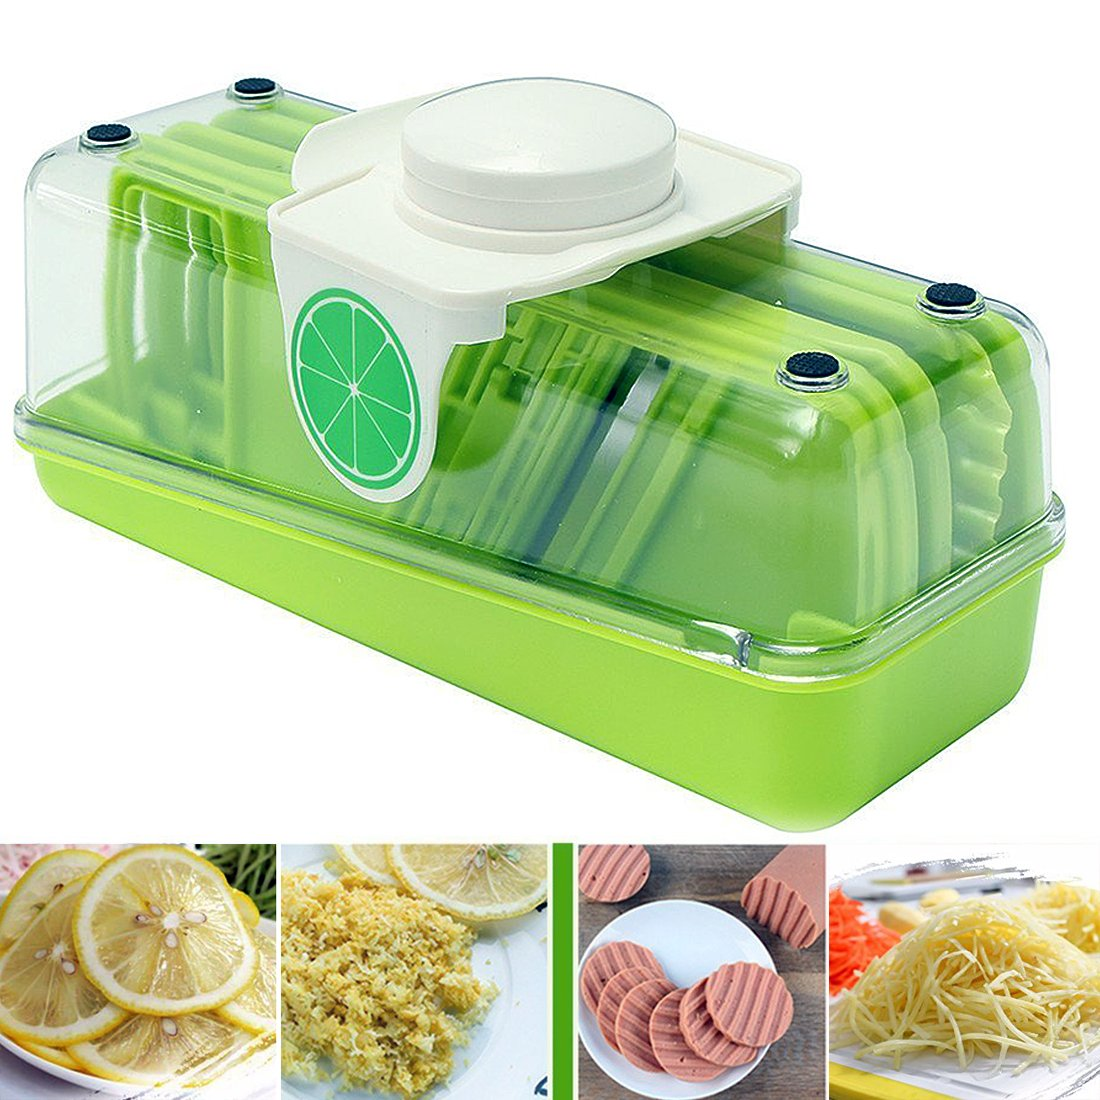 Multi-function Kitchen Tools Vegetable Carrot Cucumber Slicer Grater Wave Cutter